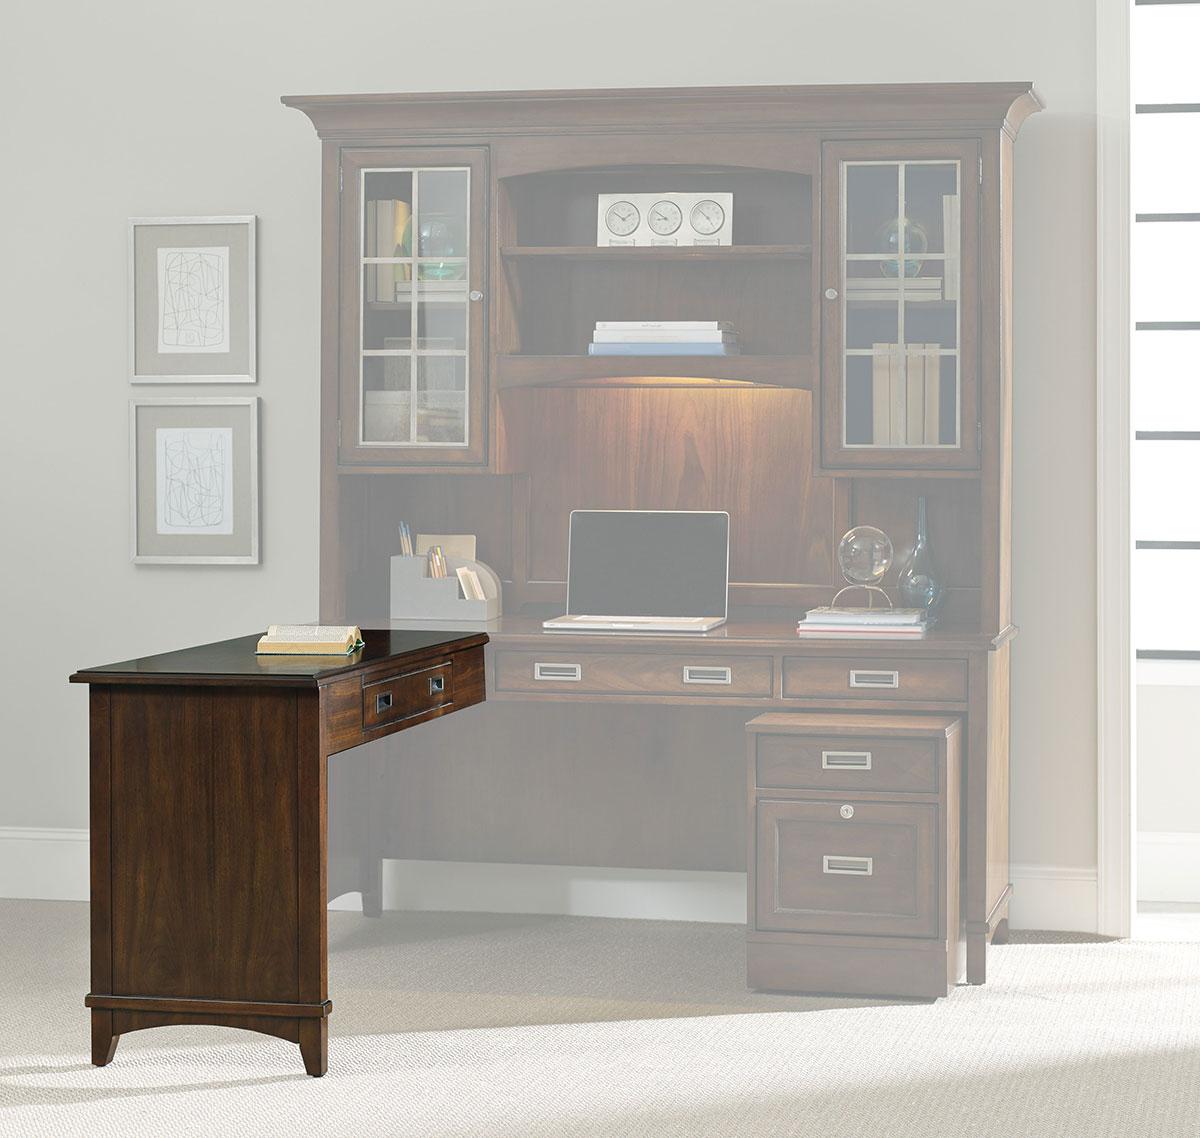 Hooker Furniture Home Office Latitude Collection Left/Right Return Dark Wood Desk